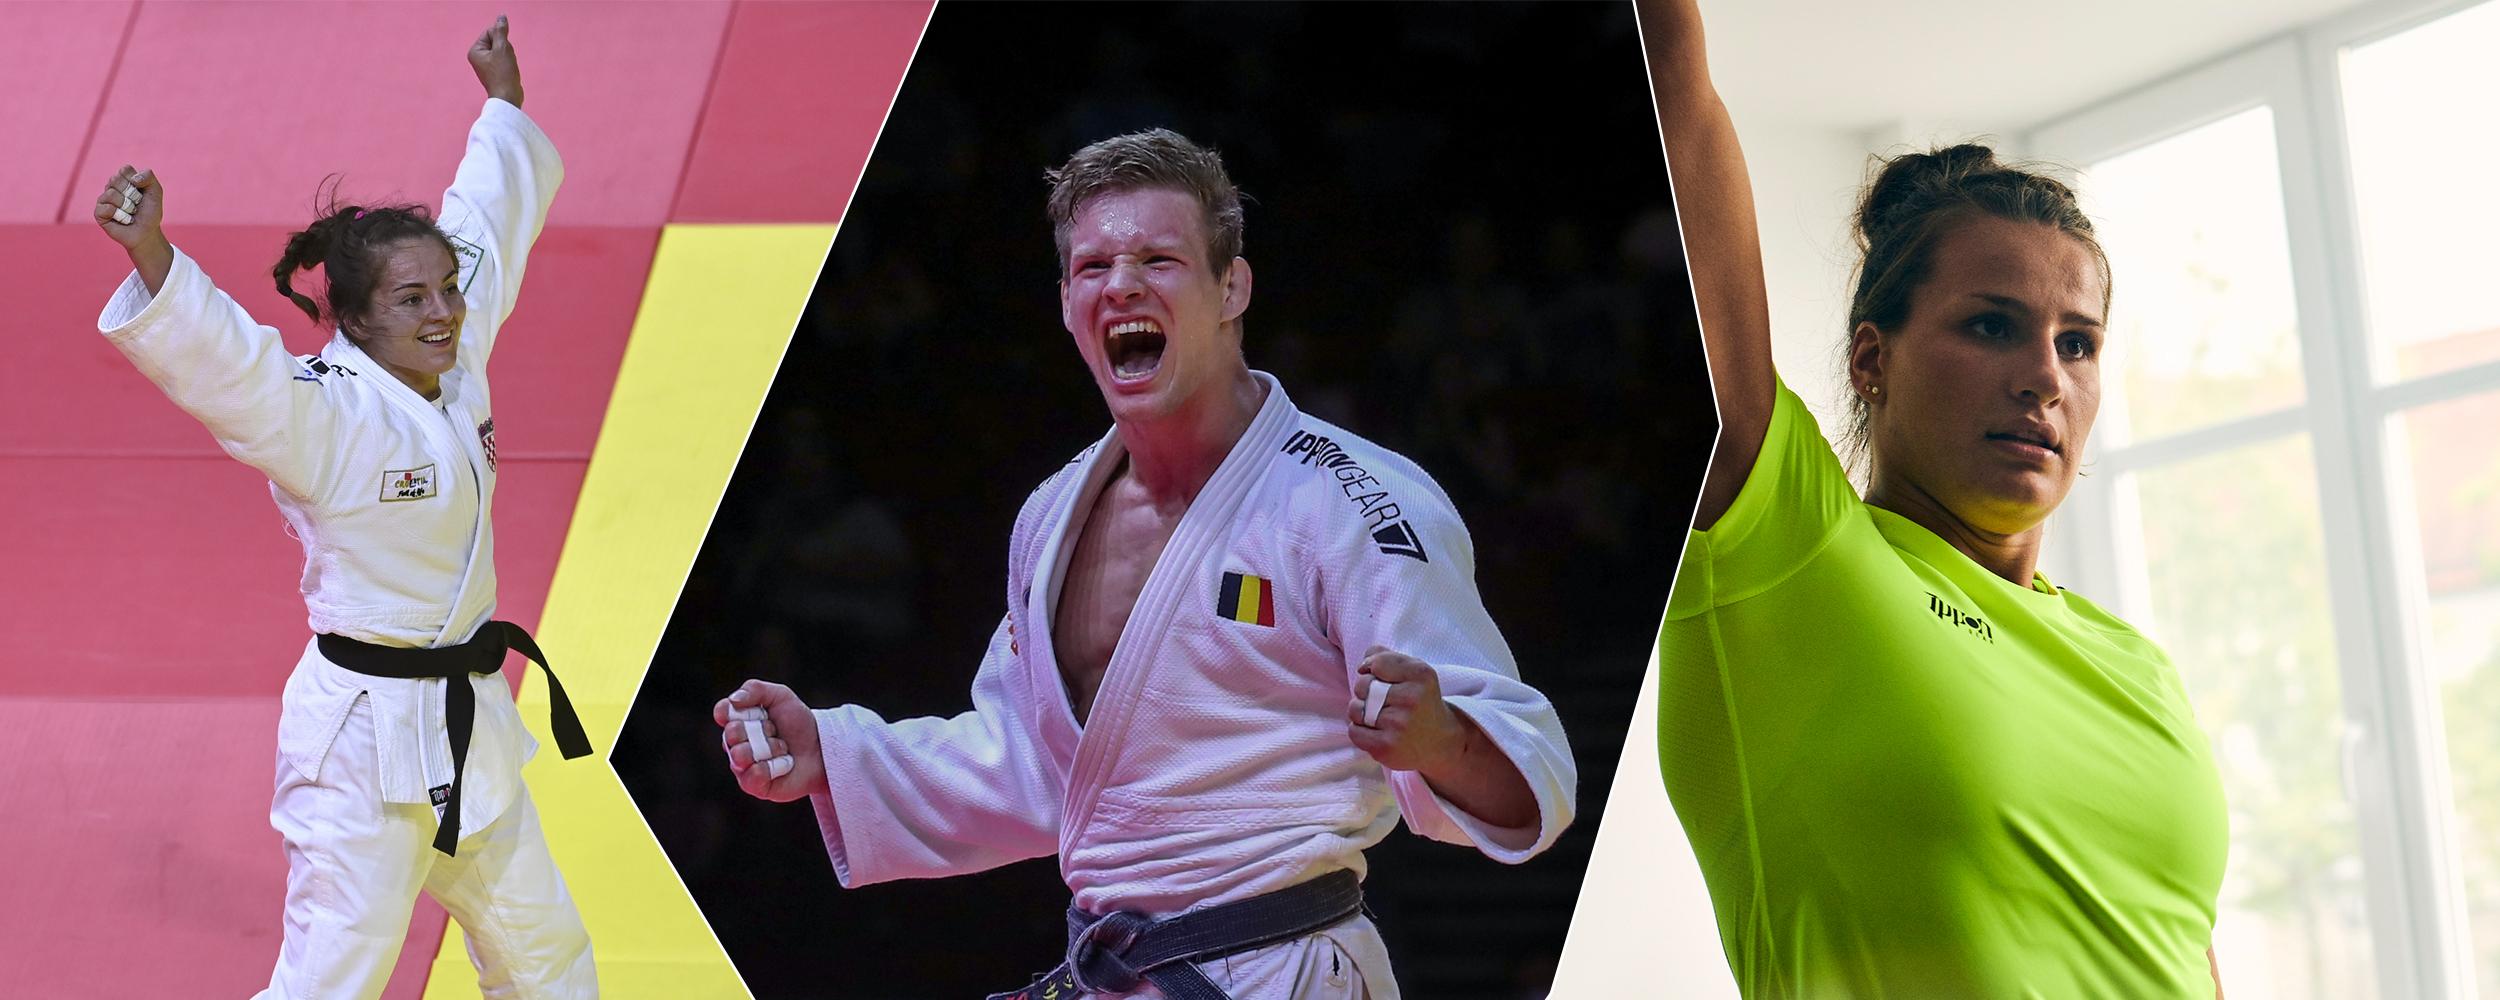 Judo_World_Championships_2021_Main_Banner